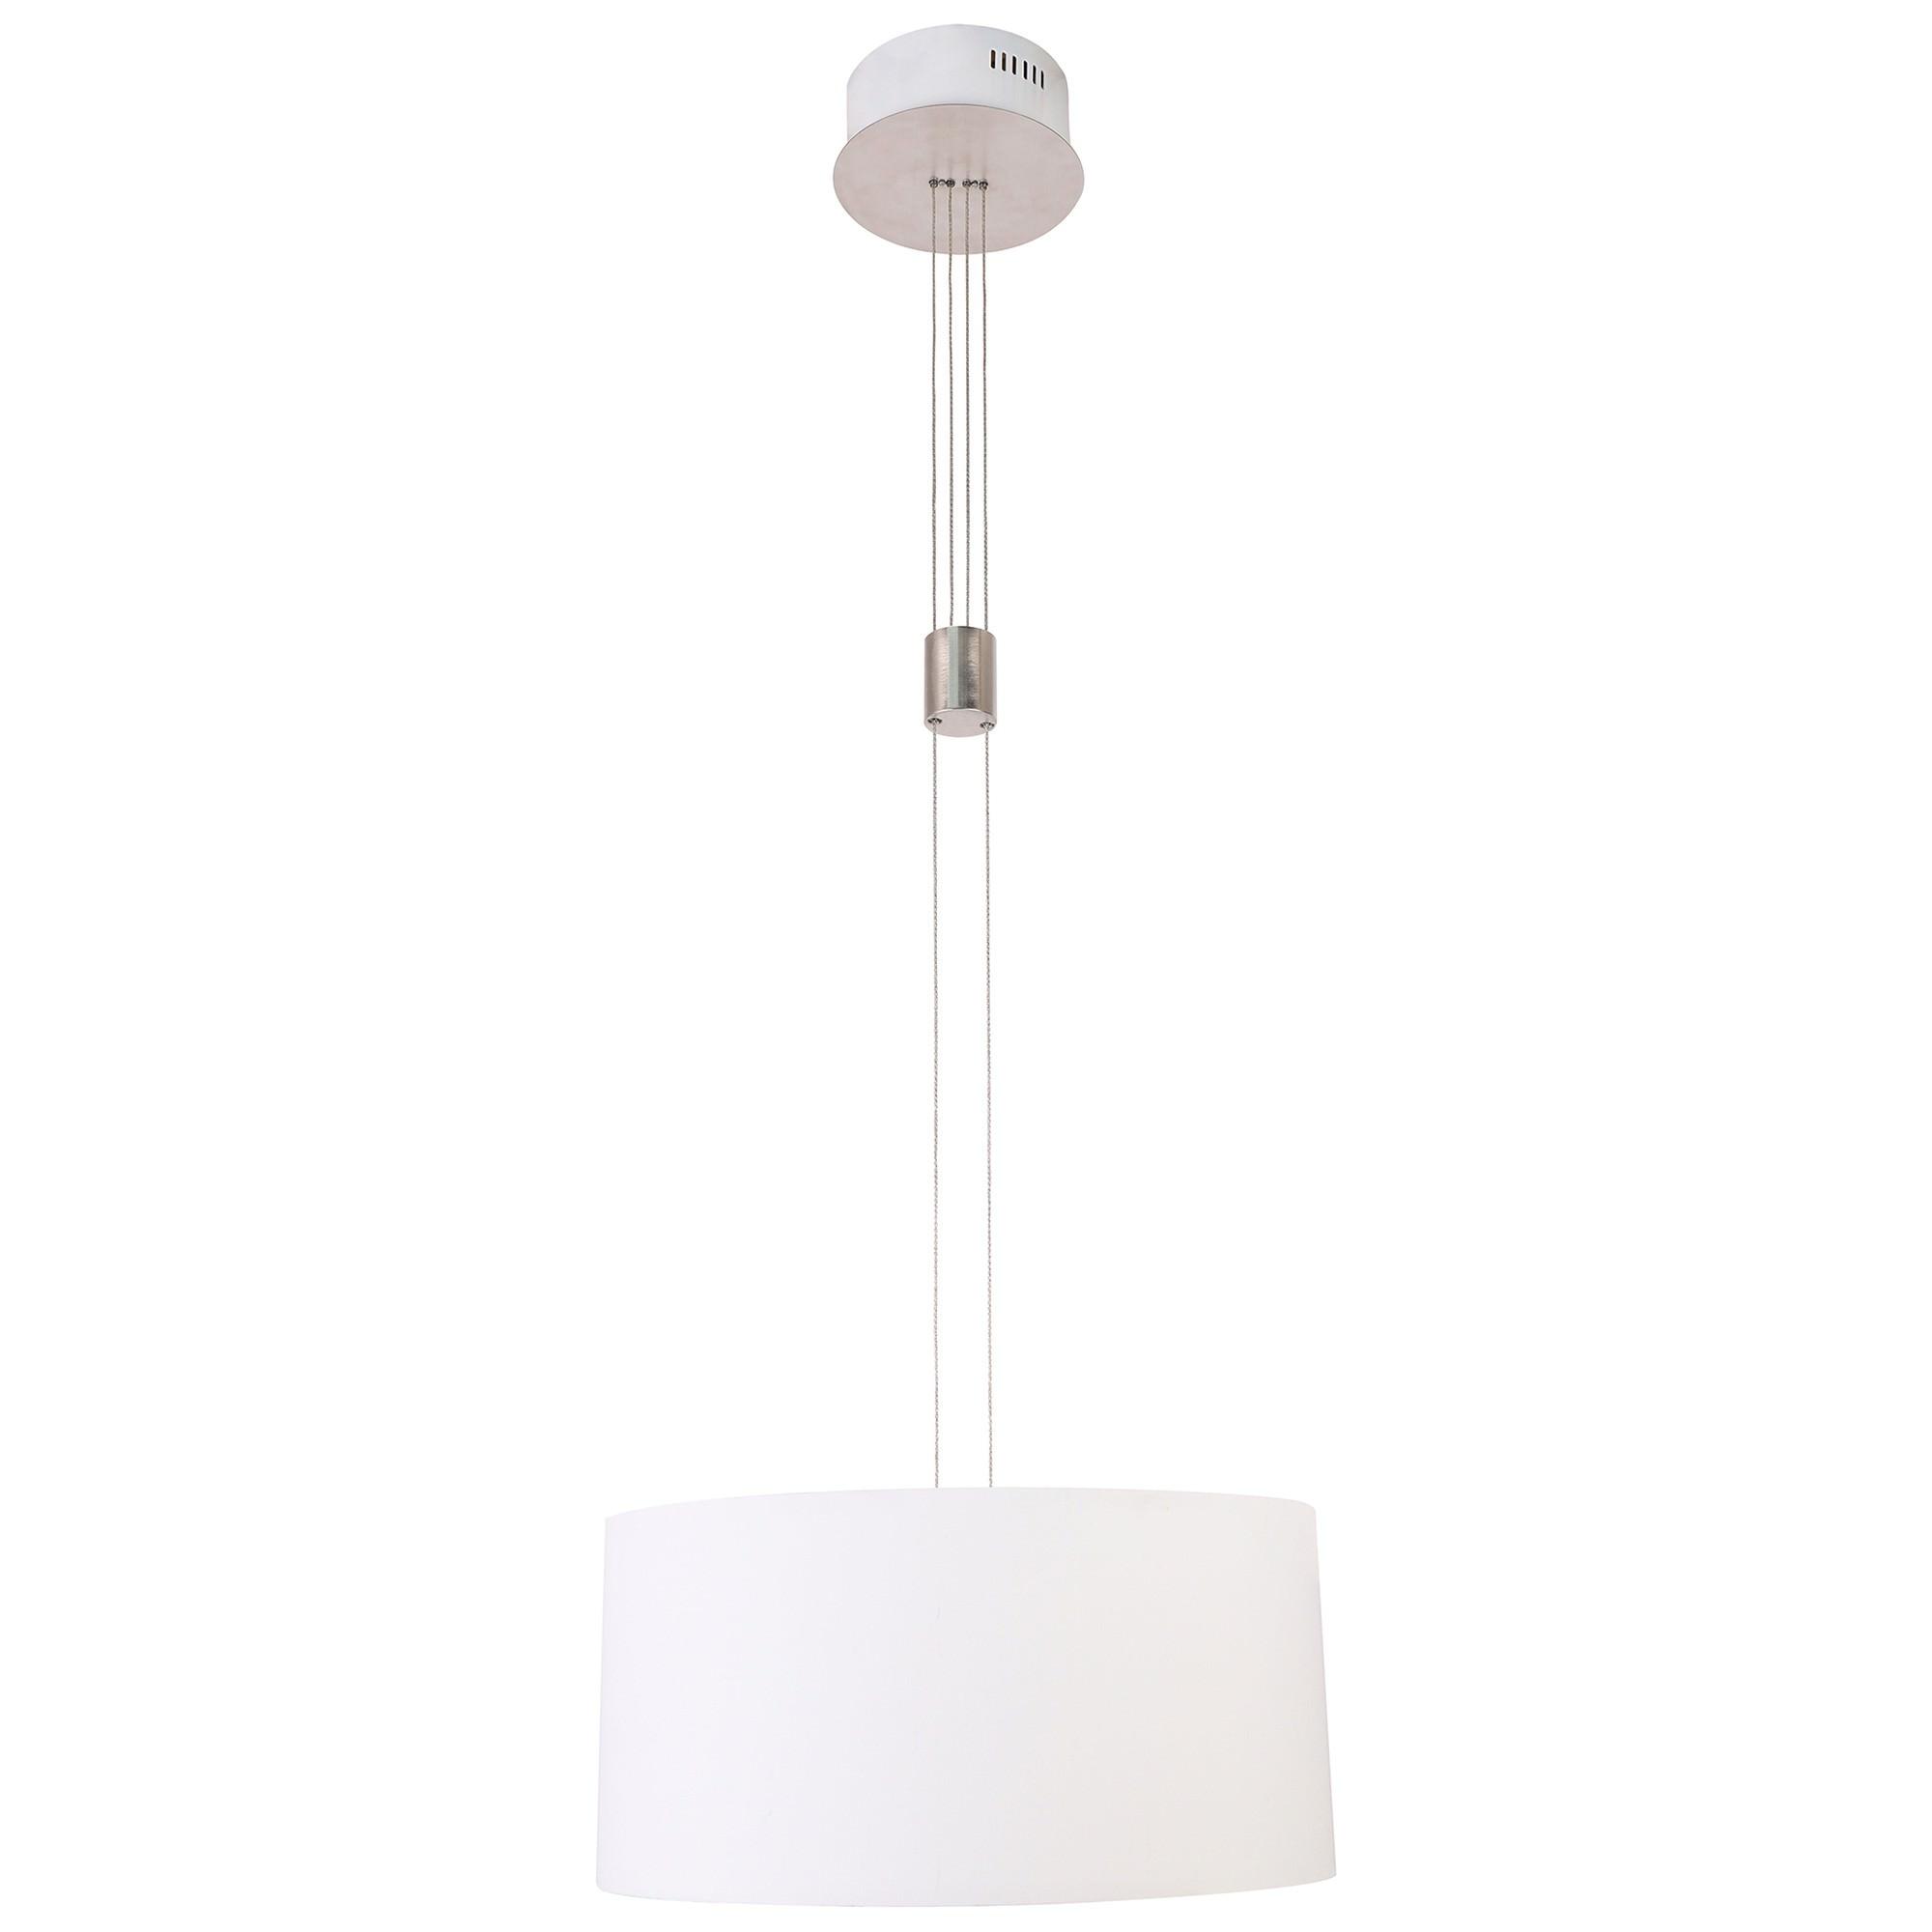 Mia Dimmable LED Rise & Fall Fabric Pendant Light, White